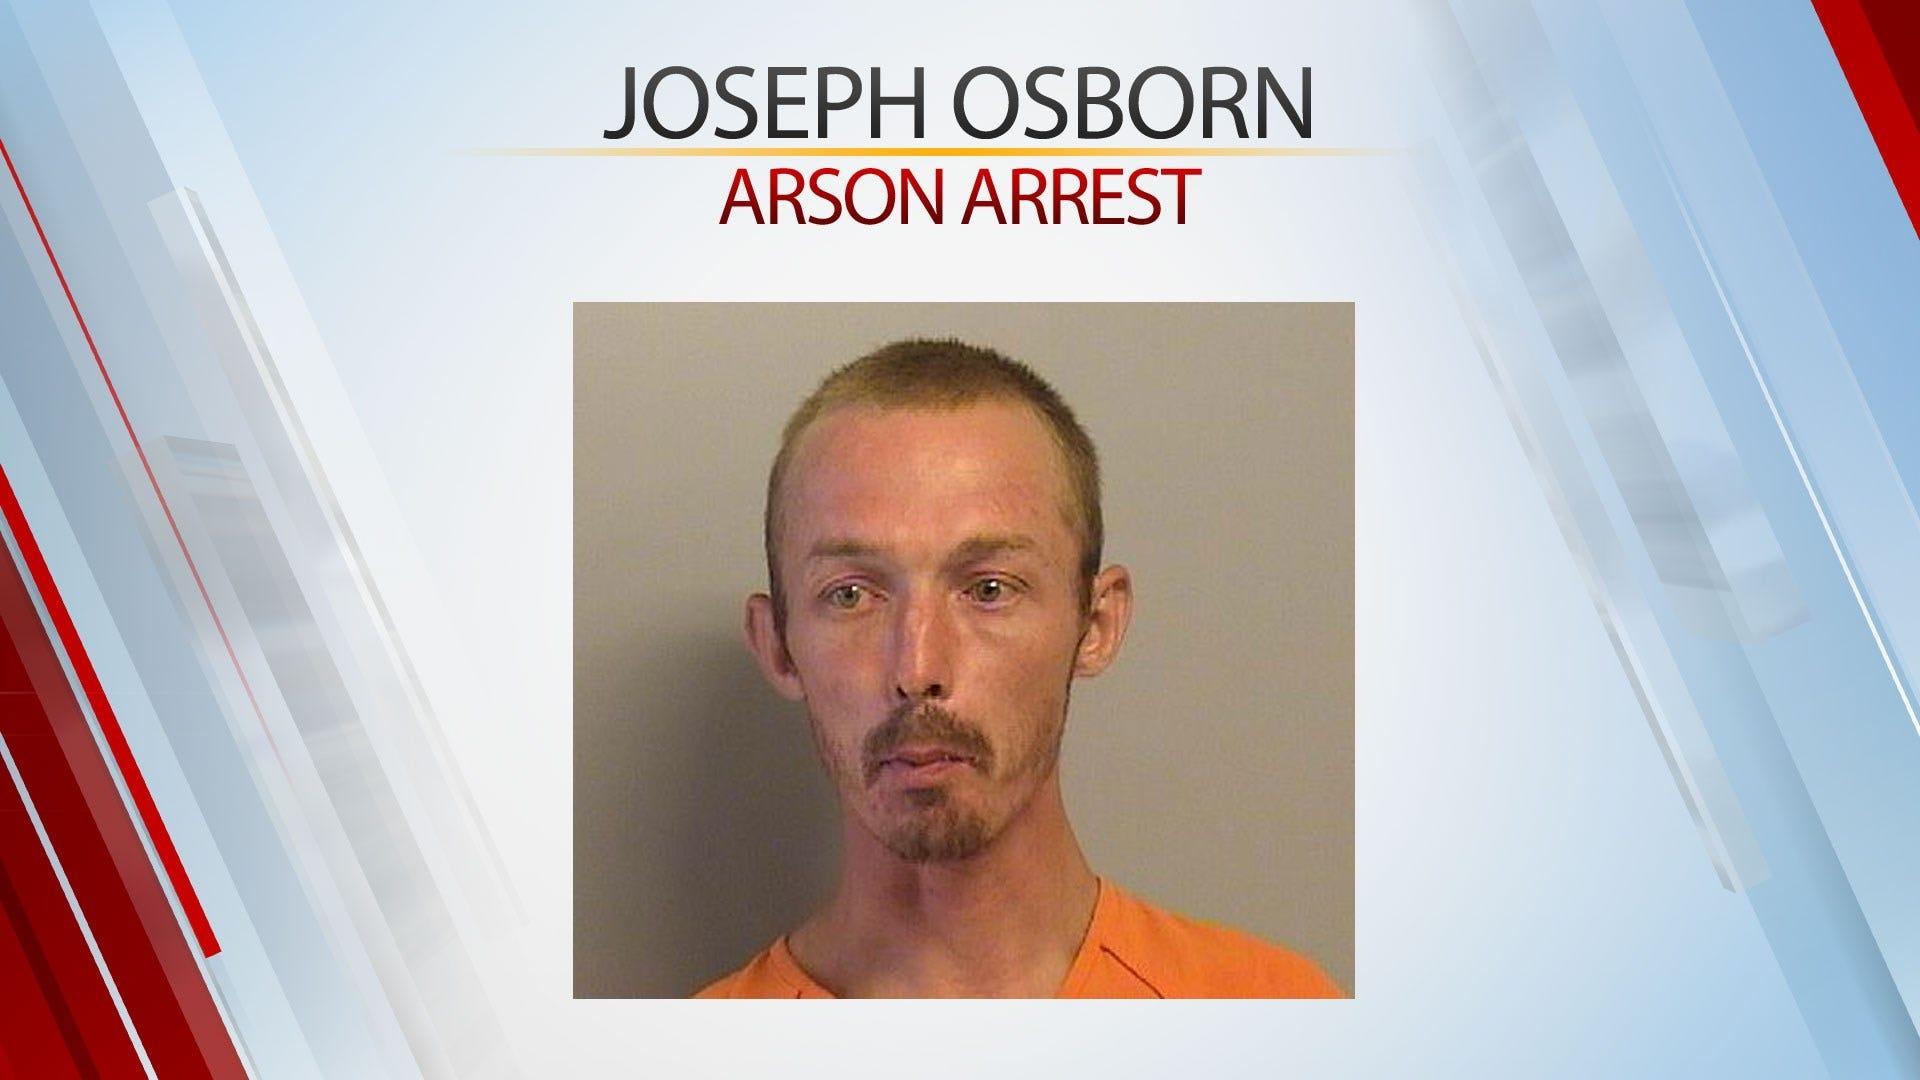 Tulsa Man Arrested On Complaints Of Arson, Endangering Human Life